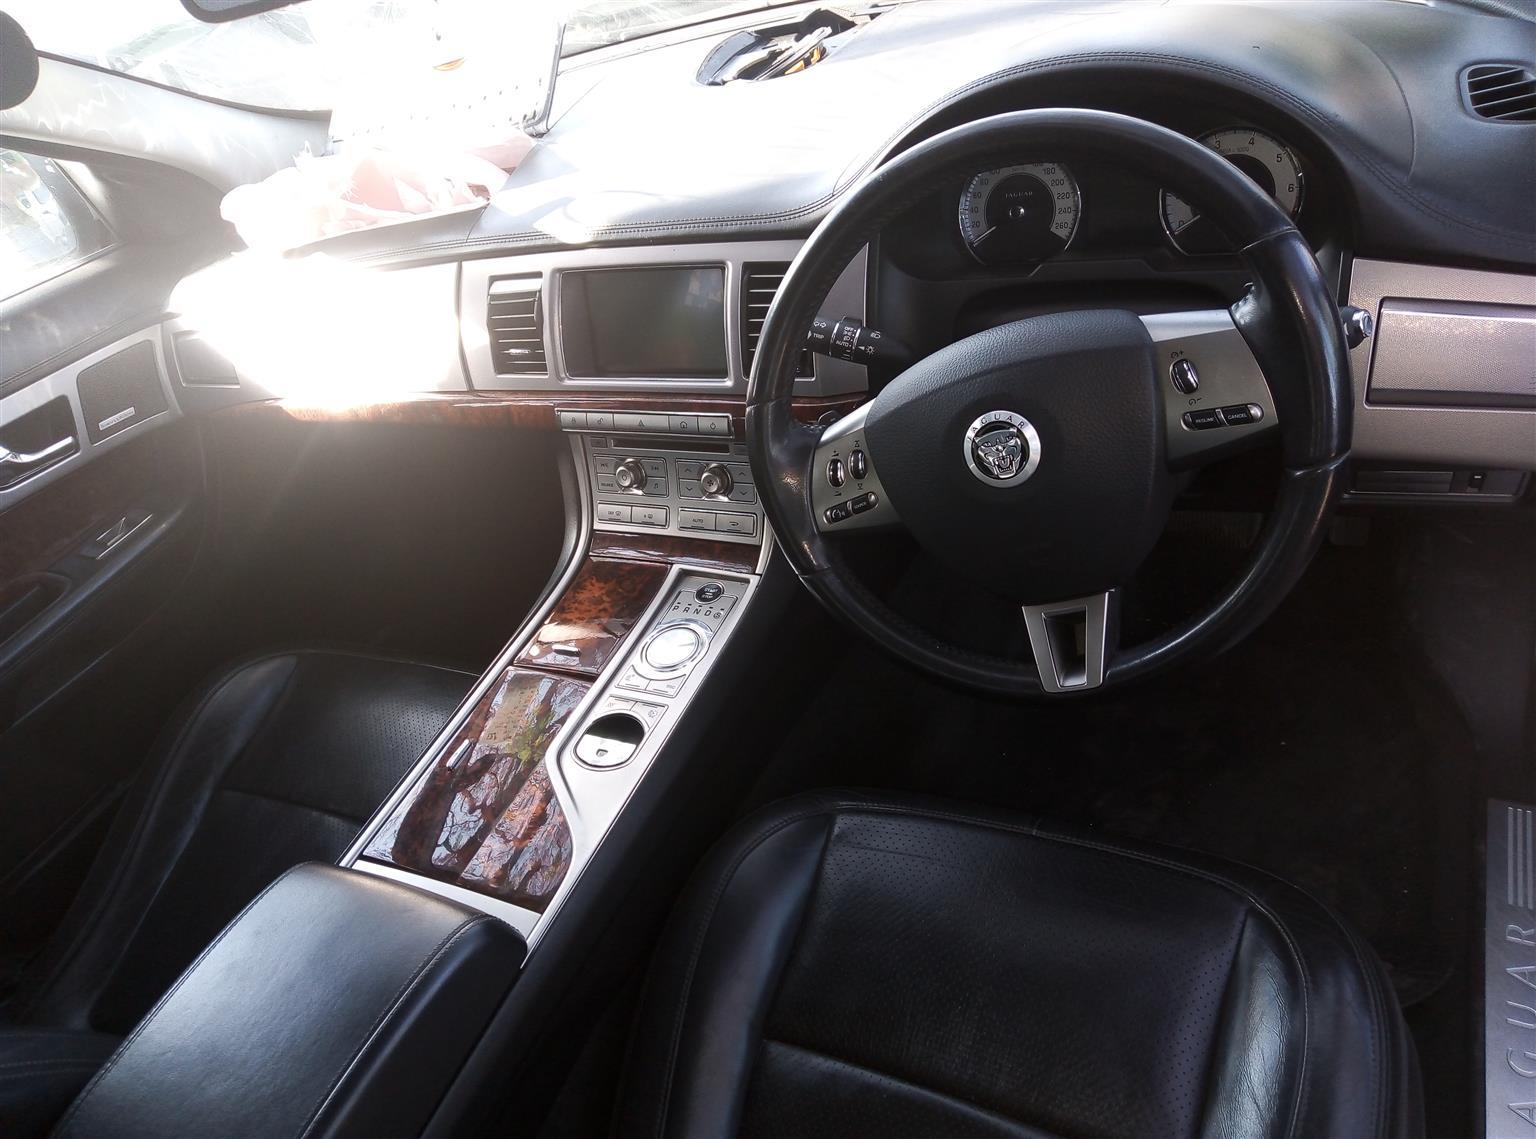 2008 Cars for Stripping Jaguar